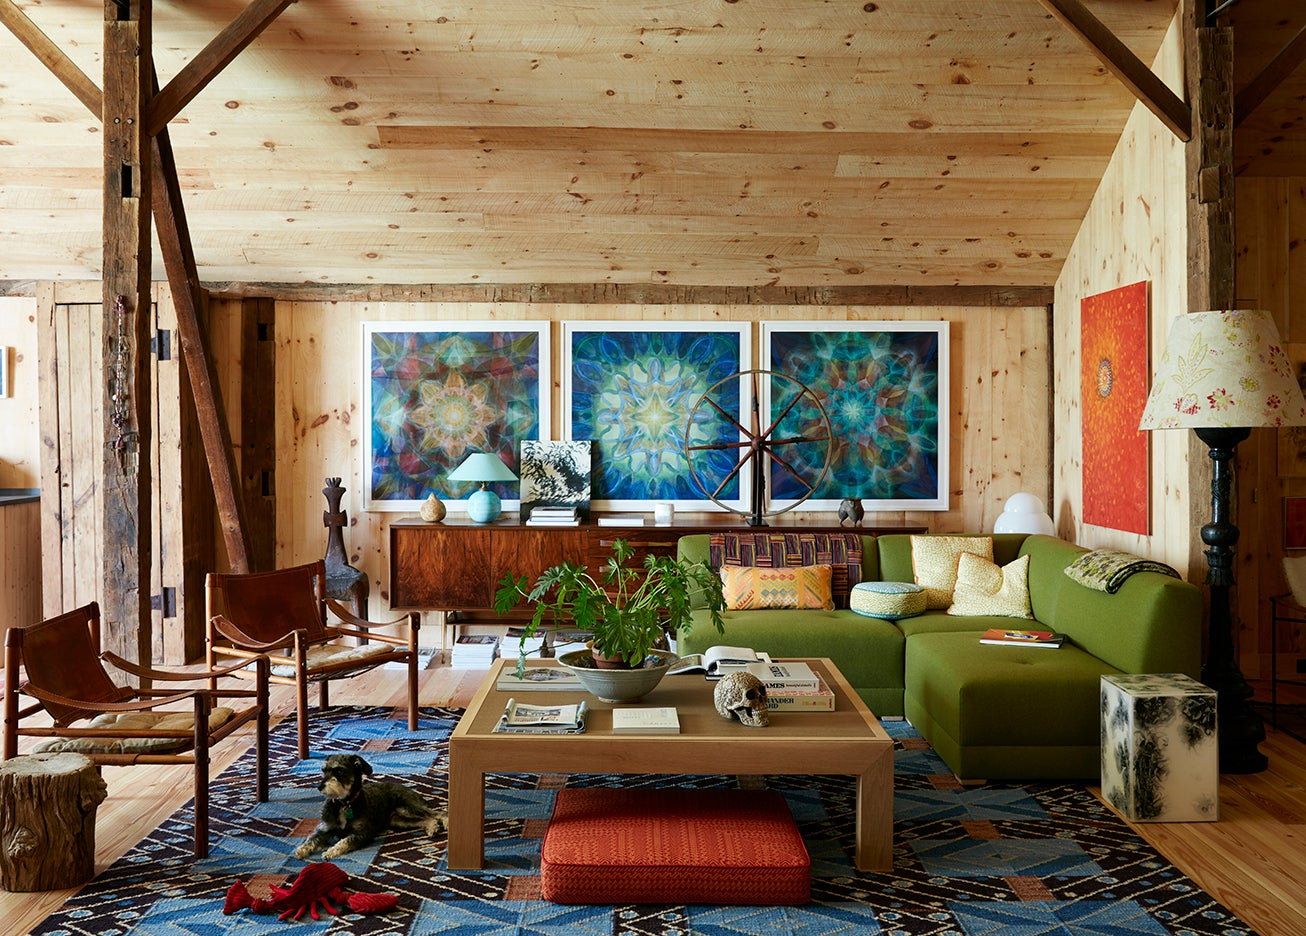 Designer Markham Roberts Turned an Upstate New York